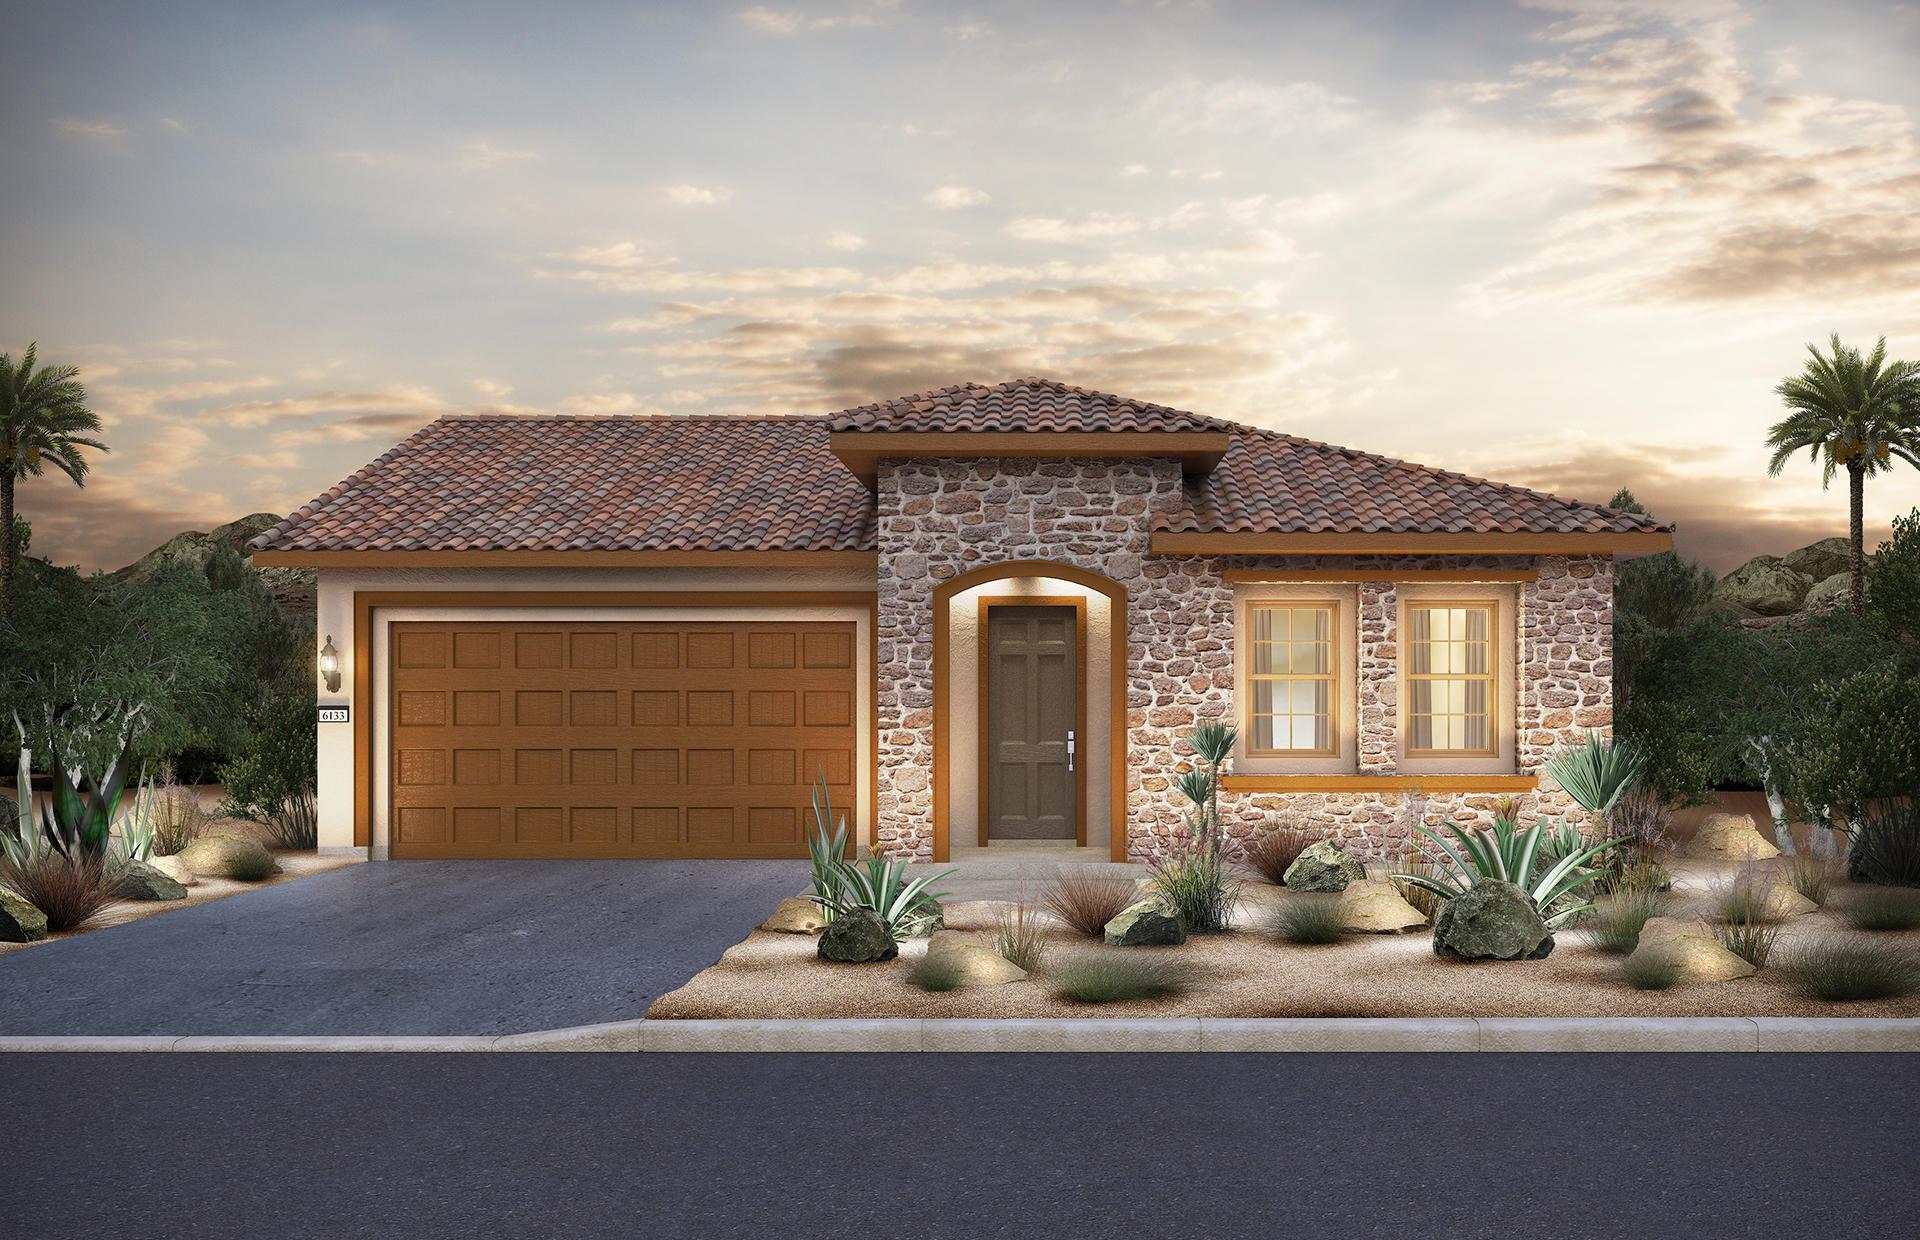 Photo of 36 Burgundy, Rancho Mirage, CA 92270